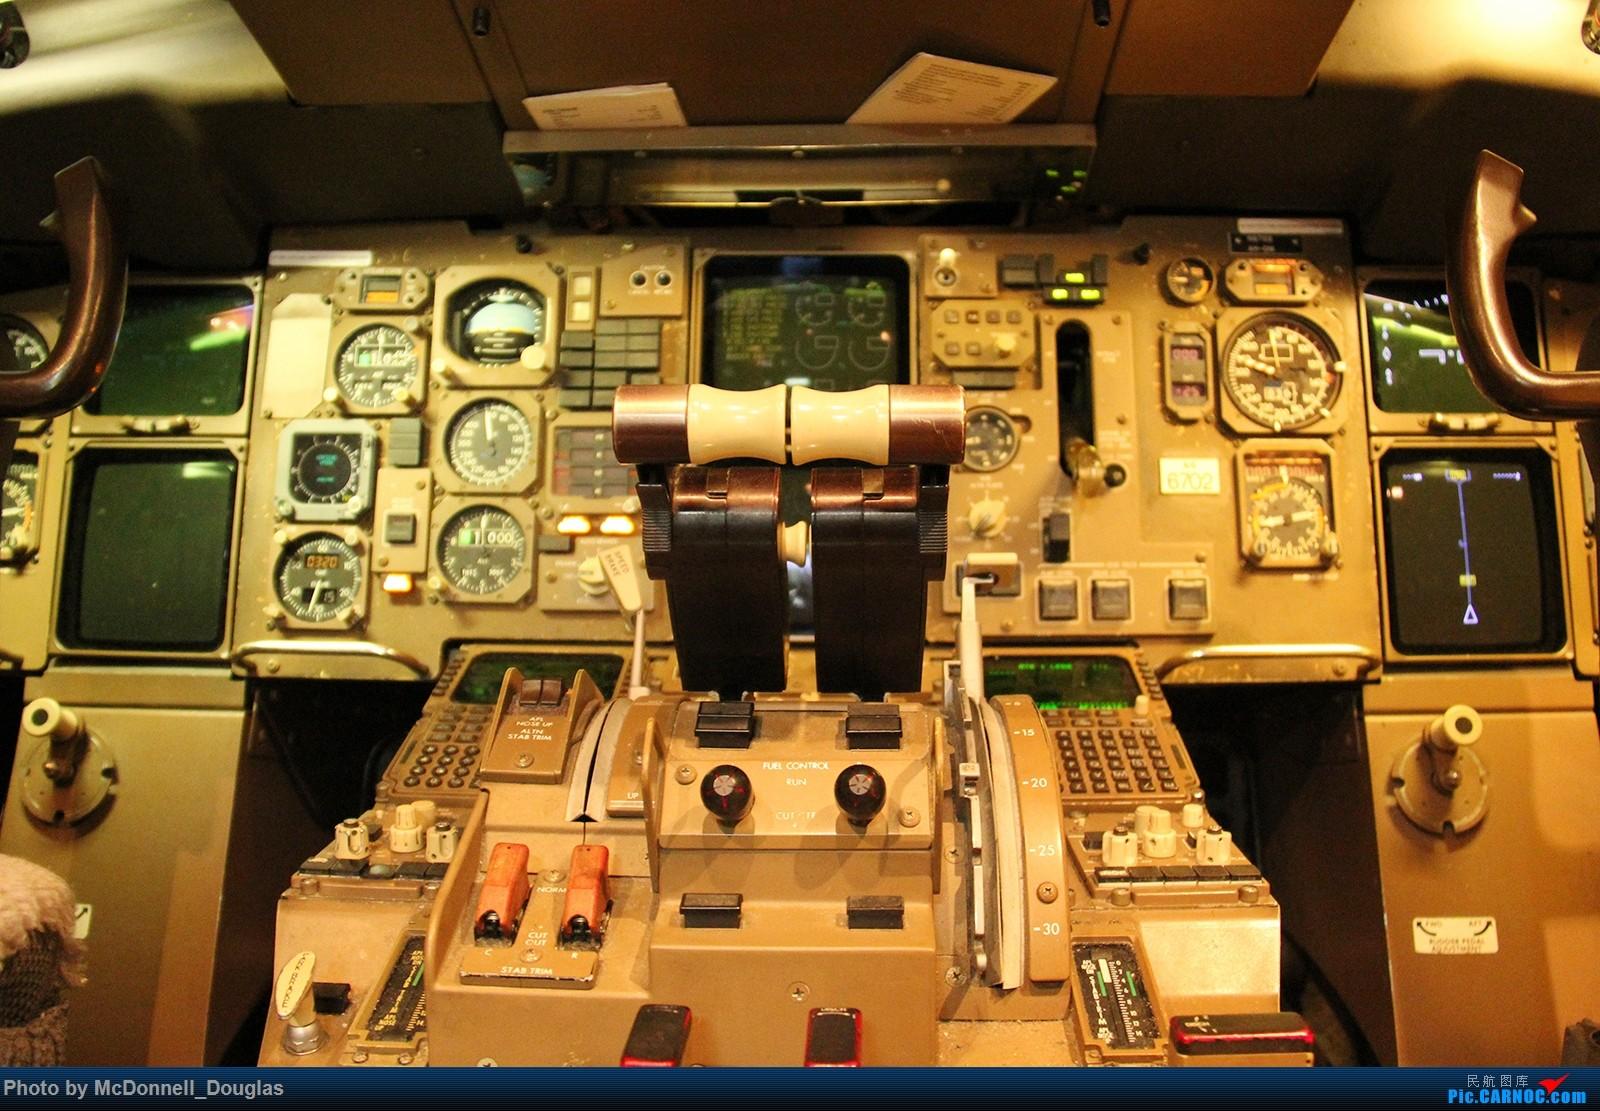 Re:[原创]【上海飞友会】图会很多,也有很多驾驶舱,杂七杂八的美帝,梦寐以求的圣马丁,这更绝不弃贴【驾驶舱已出现】 BOEING757-232 N6702 美国亚特兰大哈兹菲尔德-杰克逊国际机场